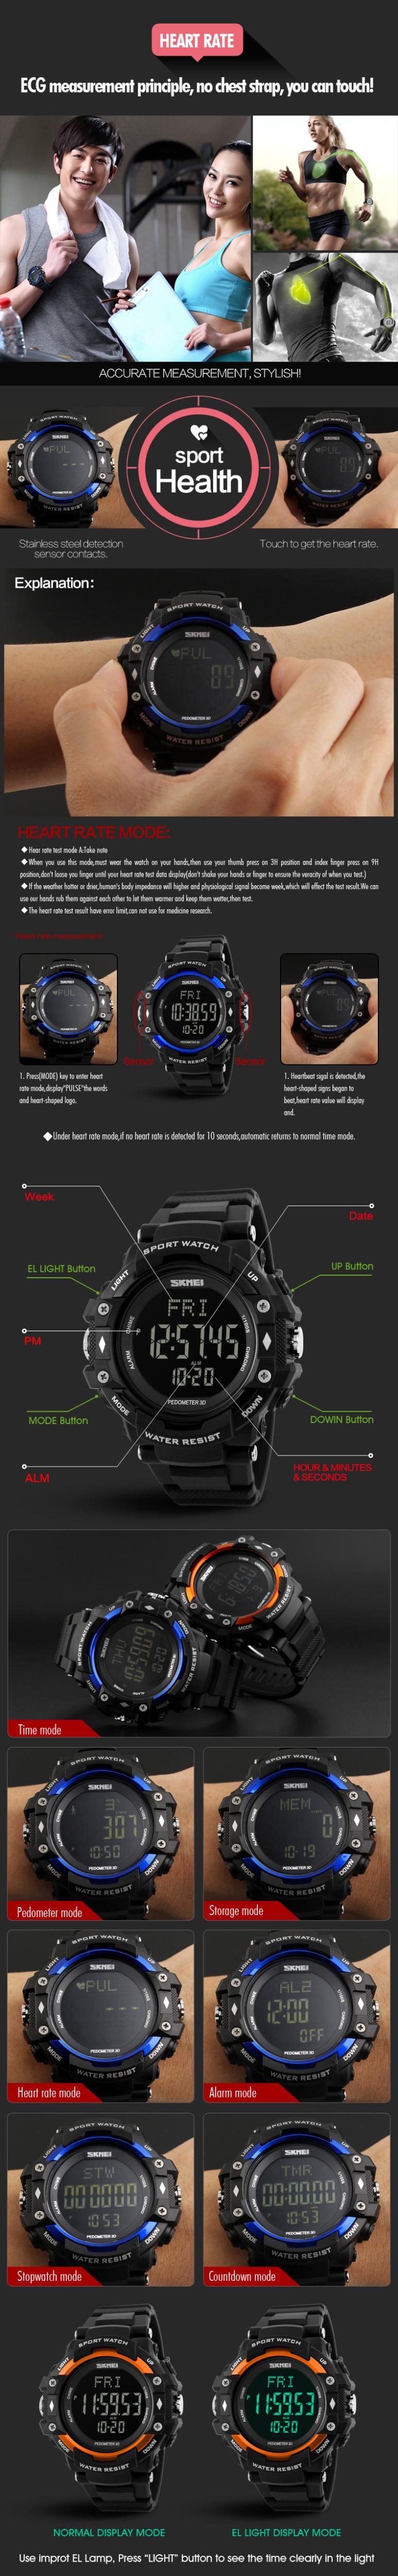 Skmei Men Sports Watches 3d Pedometer Heart Rate Monitor Calories Counter 50m Waterproof Digital Led Mens Wristwatches Men's Watches Digital Watches